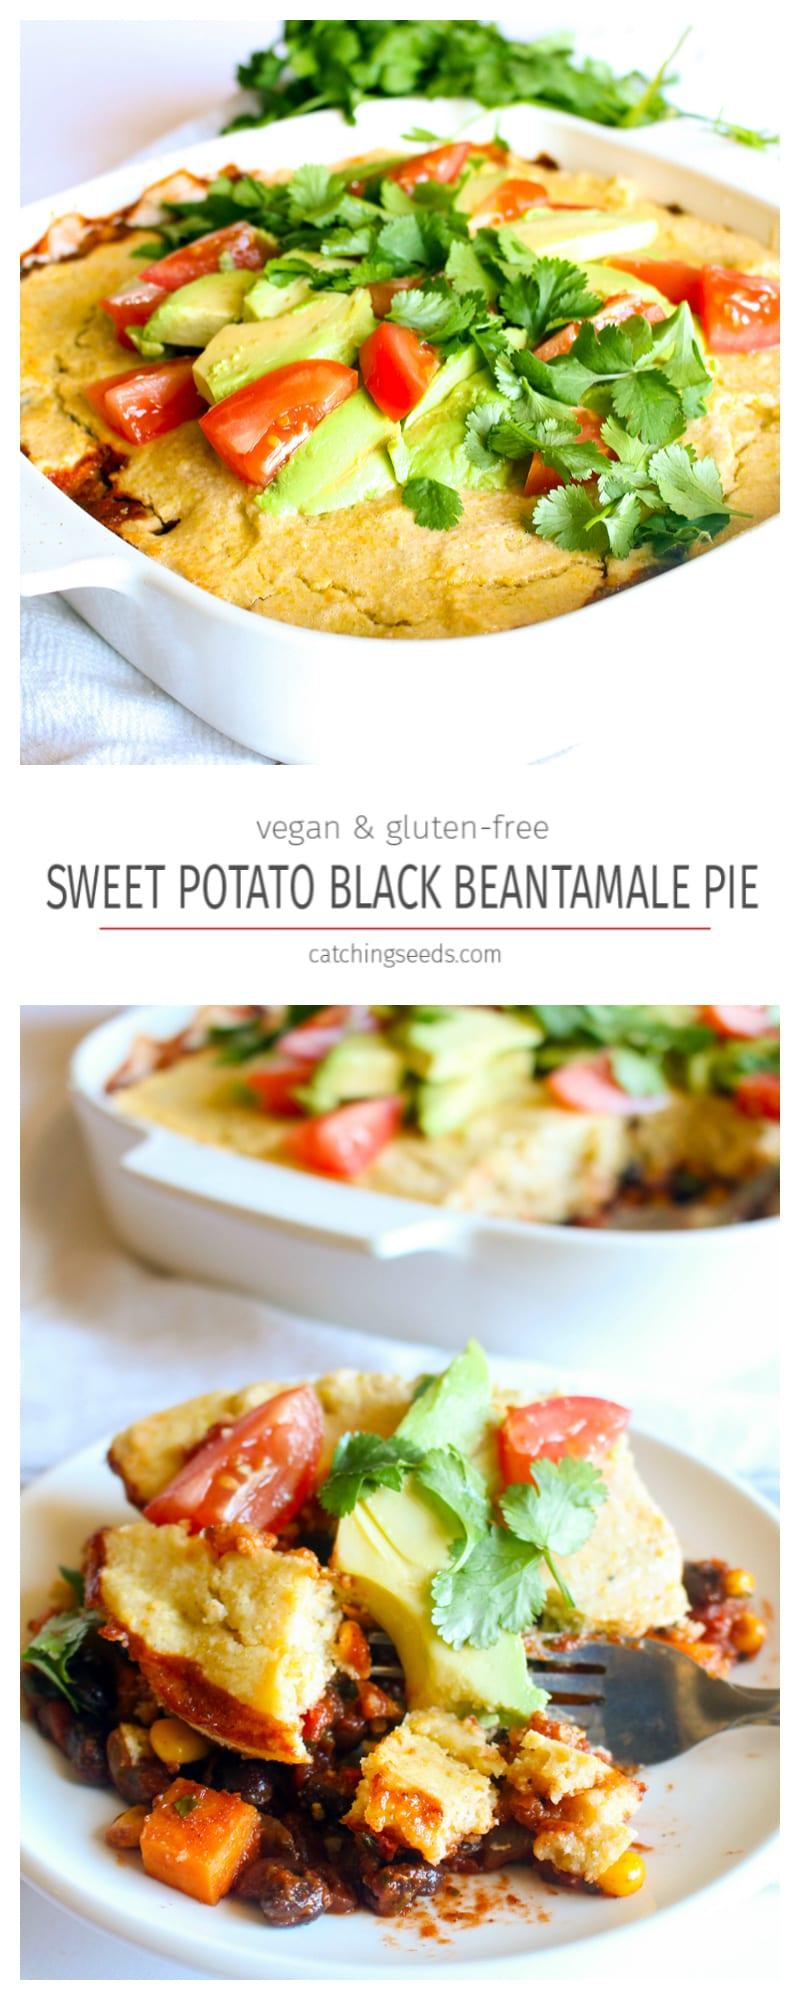 Sweet Potato Black Bean Tamale Pie